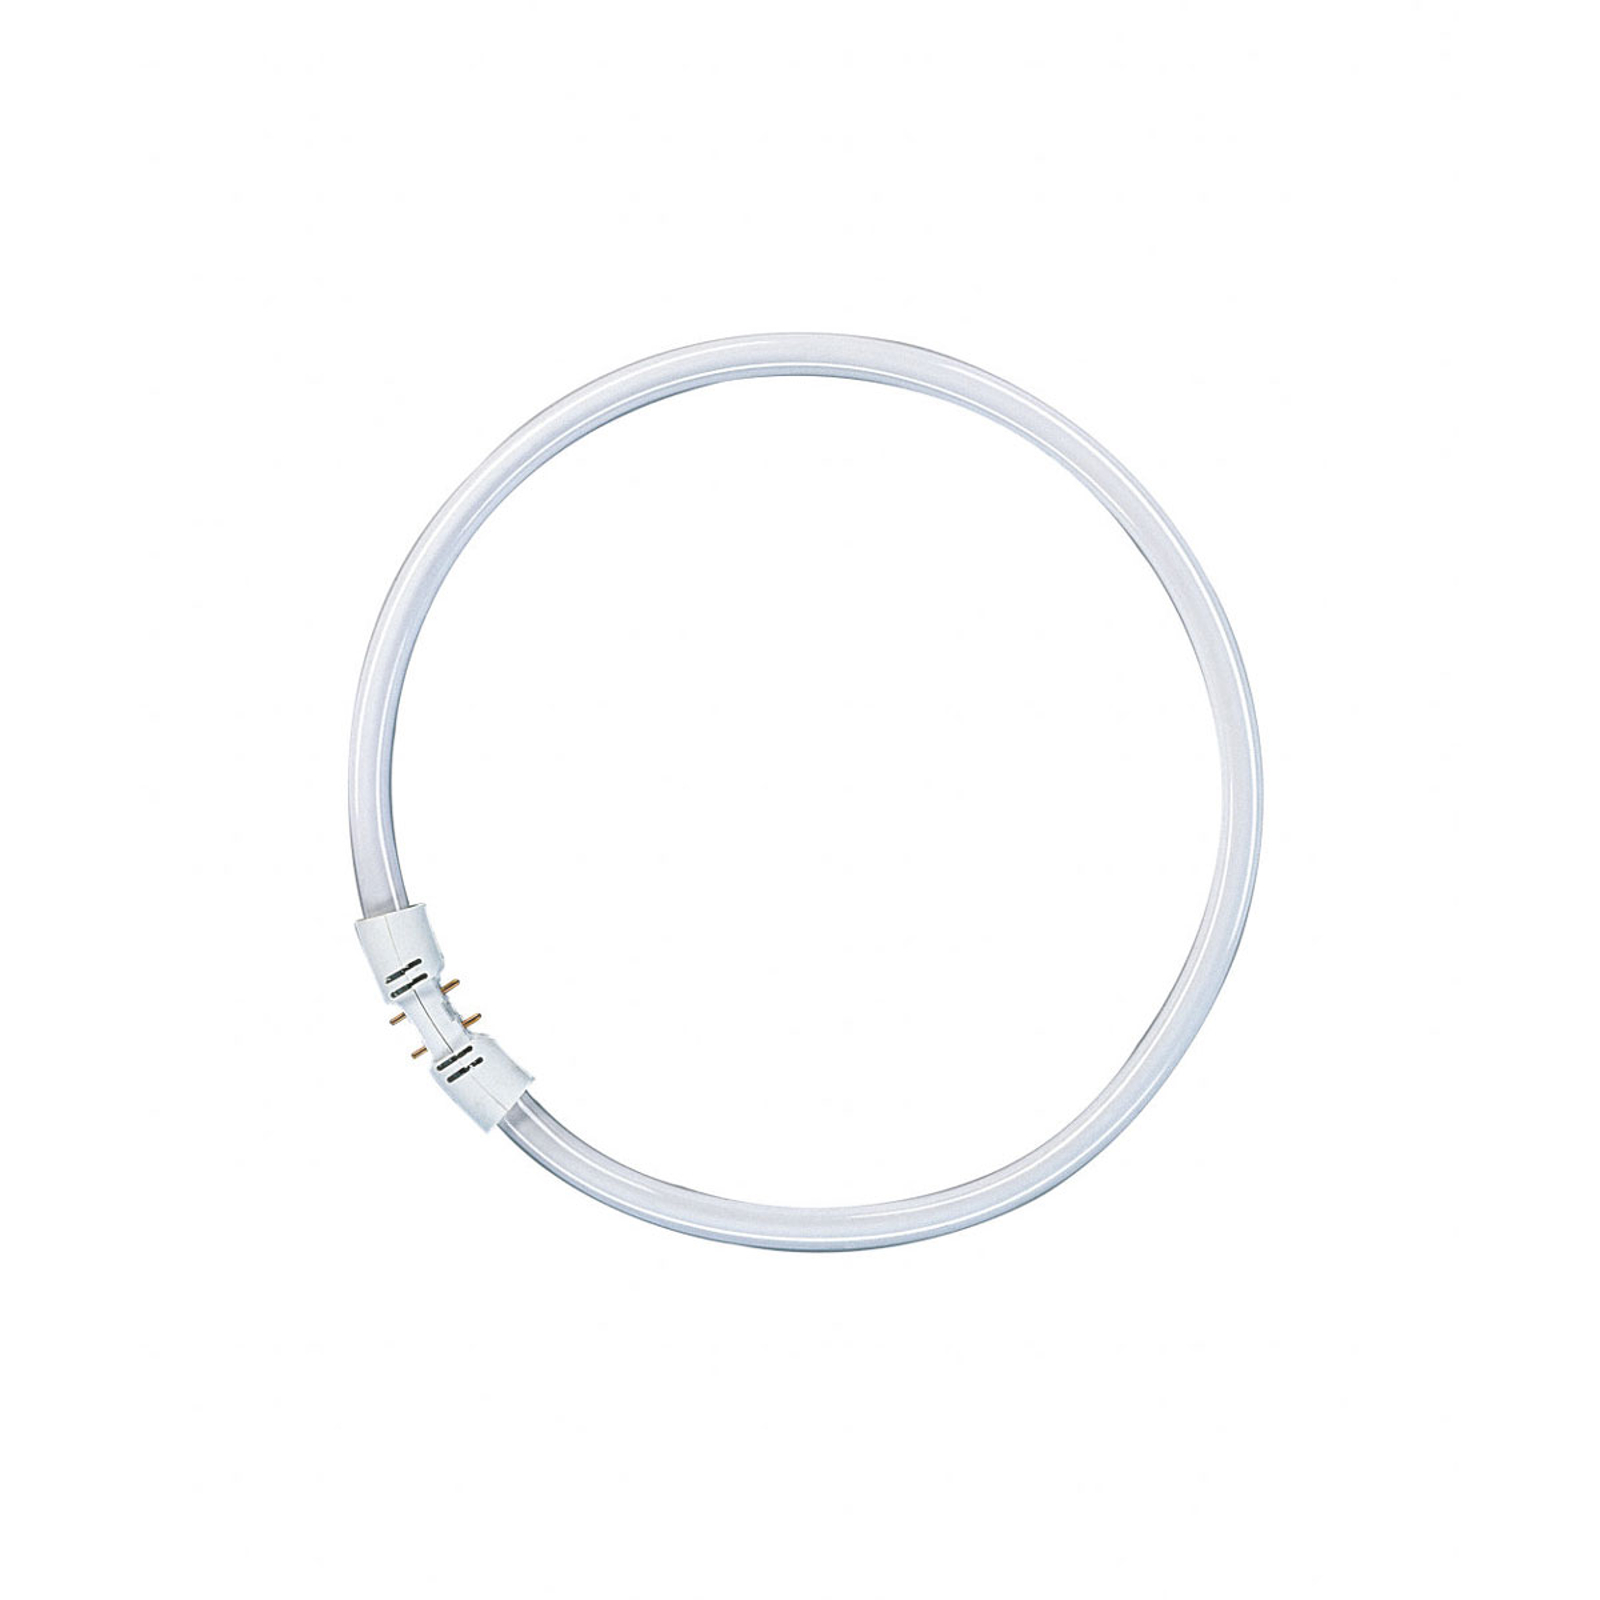 2Gx13 LUMILUX T5 Ring-lysstoffpære 22W 840